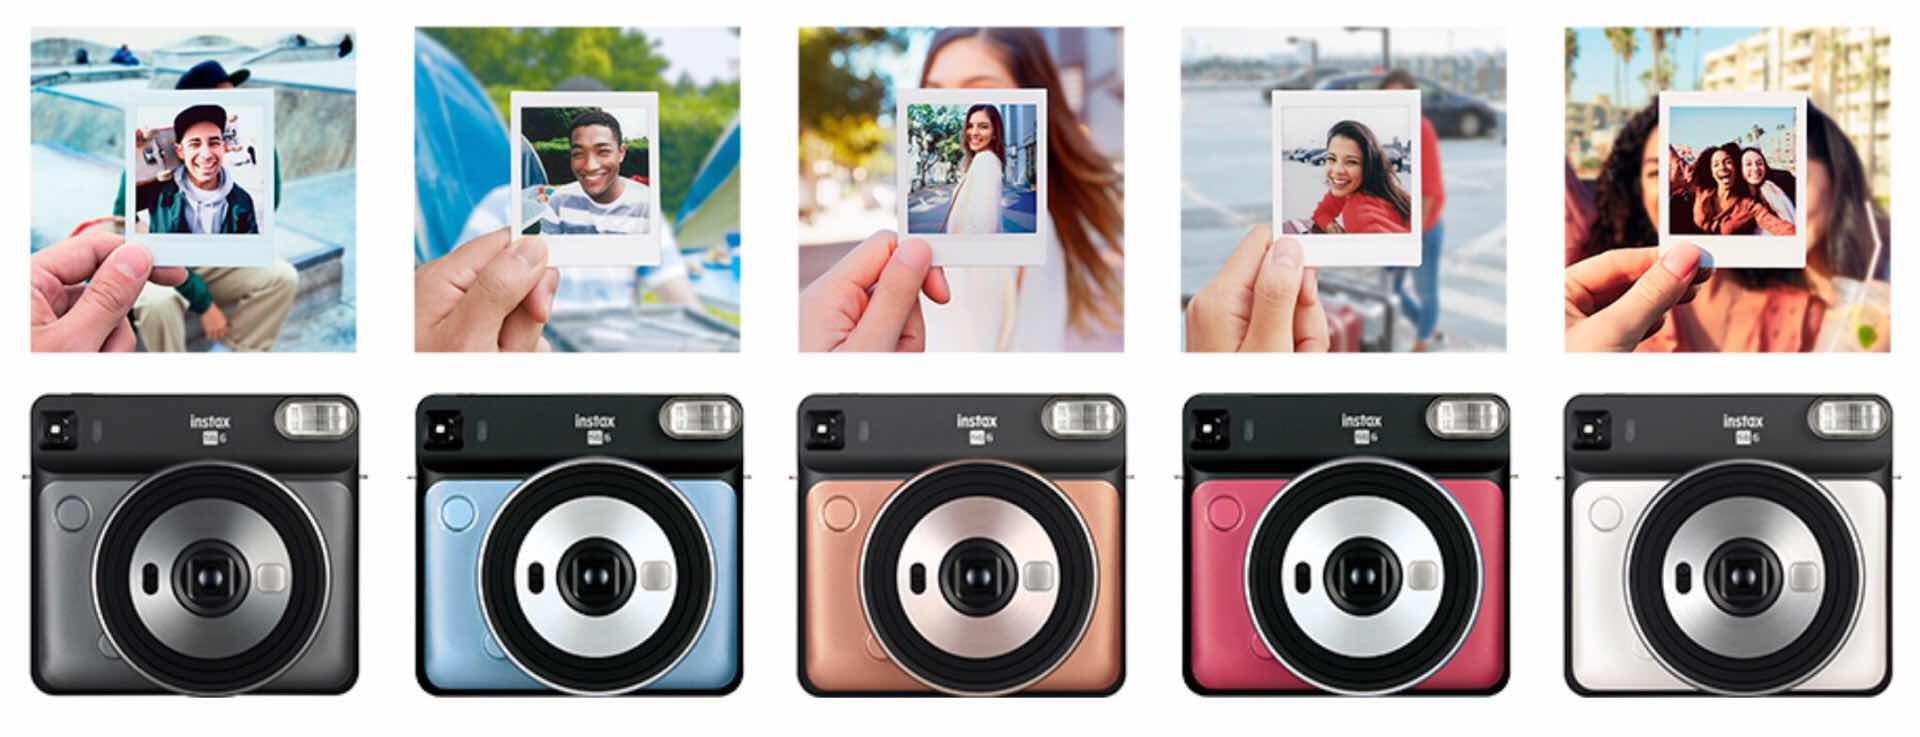 fujifilm-instax-square-sq6-instant-film-camera